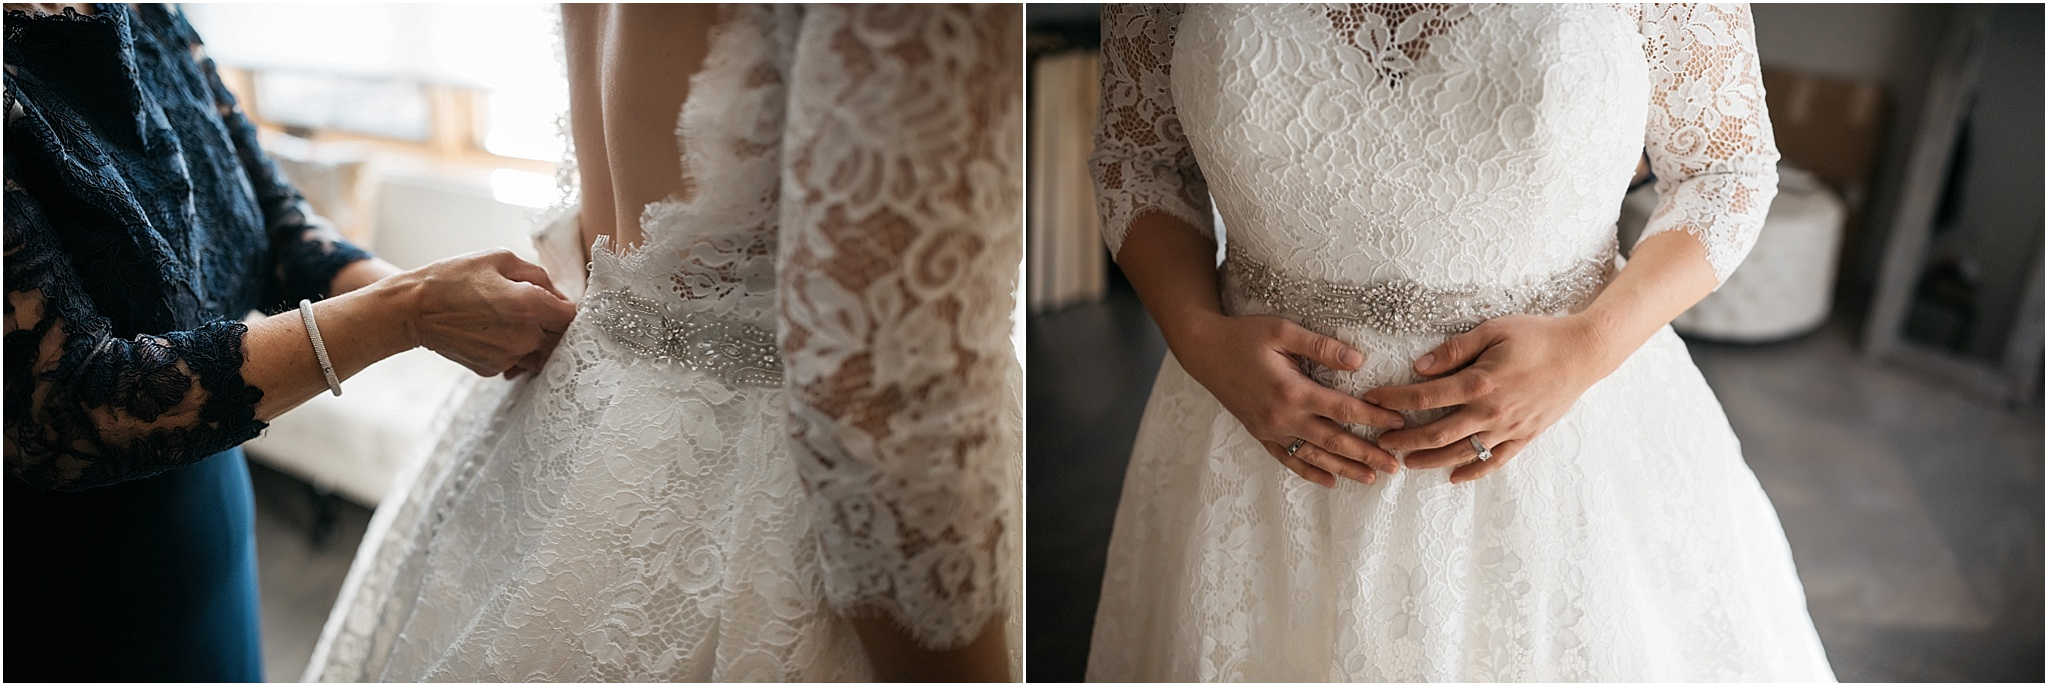 Indianapolis-Wedding-Photographer_0685.jpg